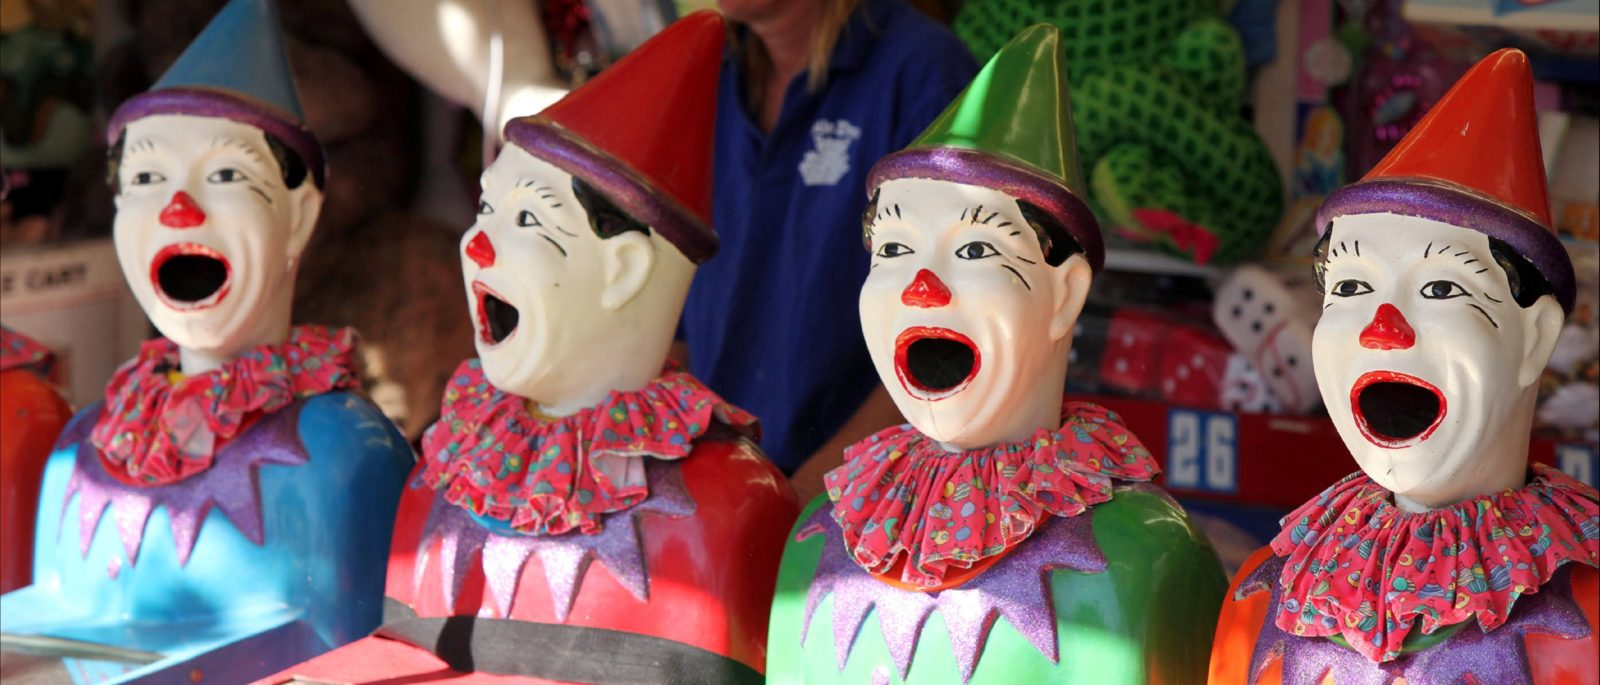 Three Sideshow Clowns in a row